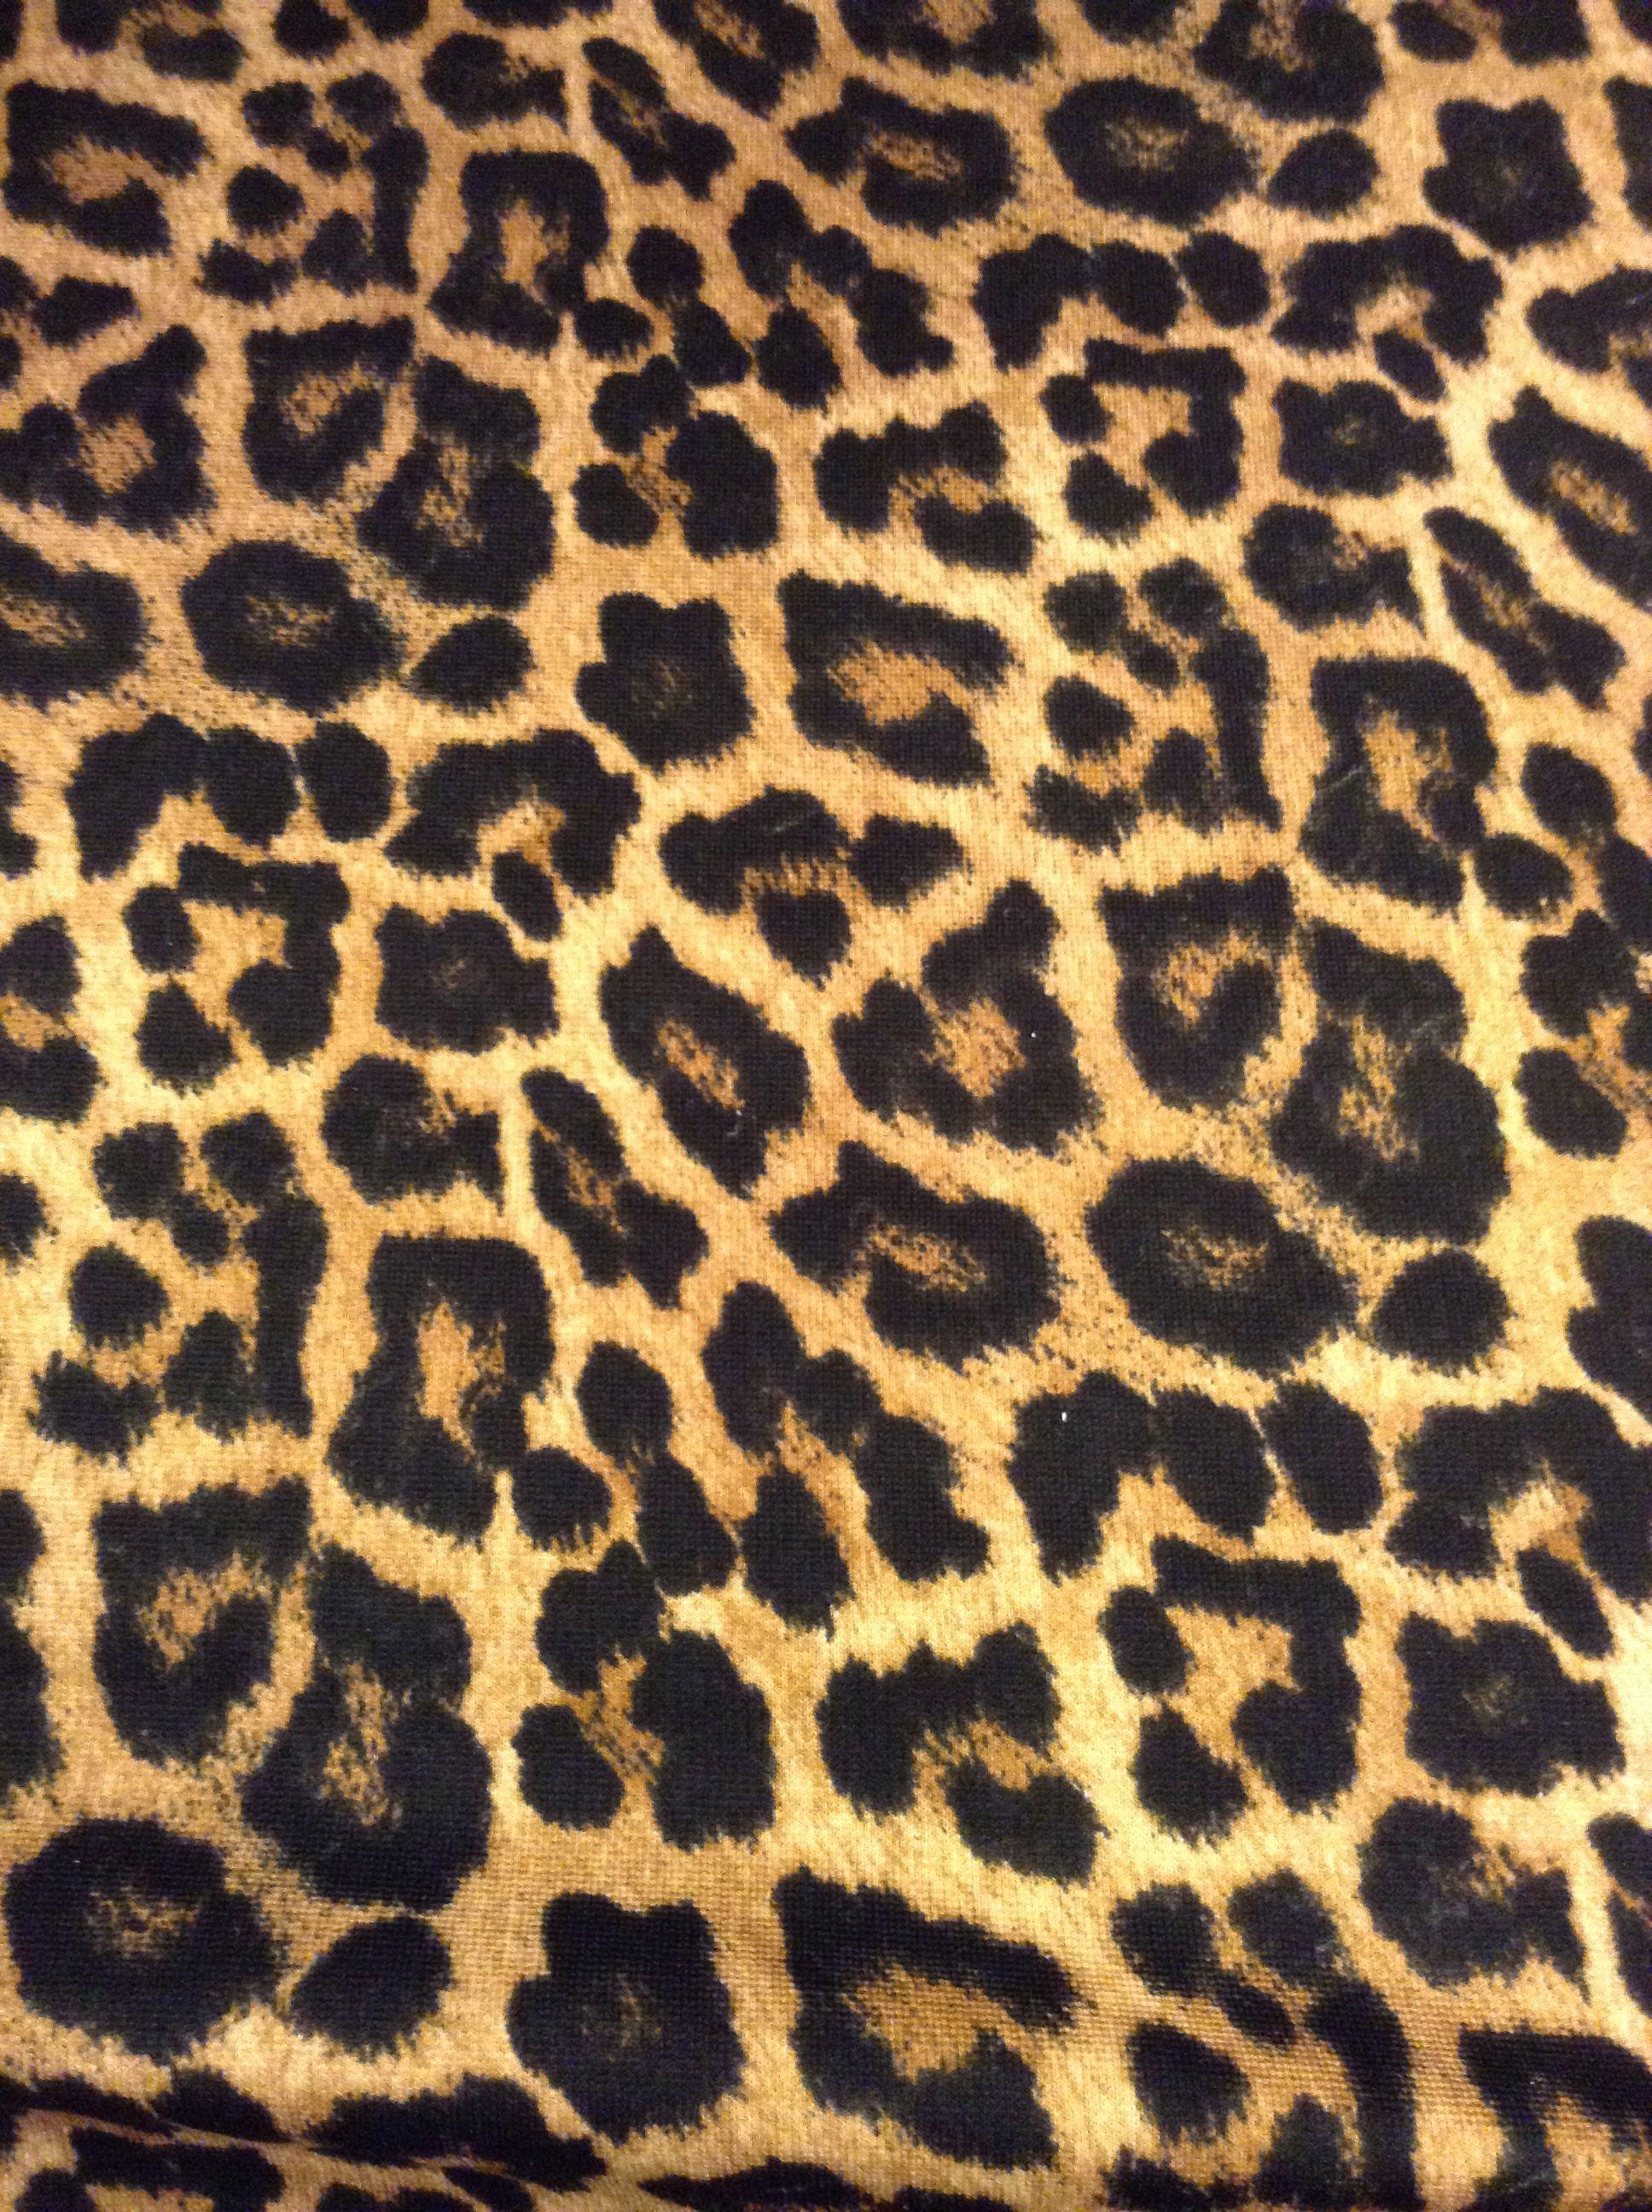 leopard pattern 2 print - photo #1